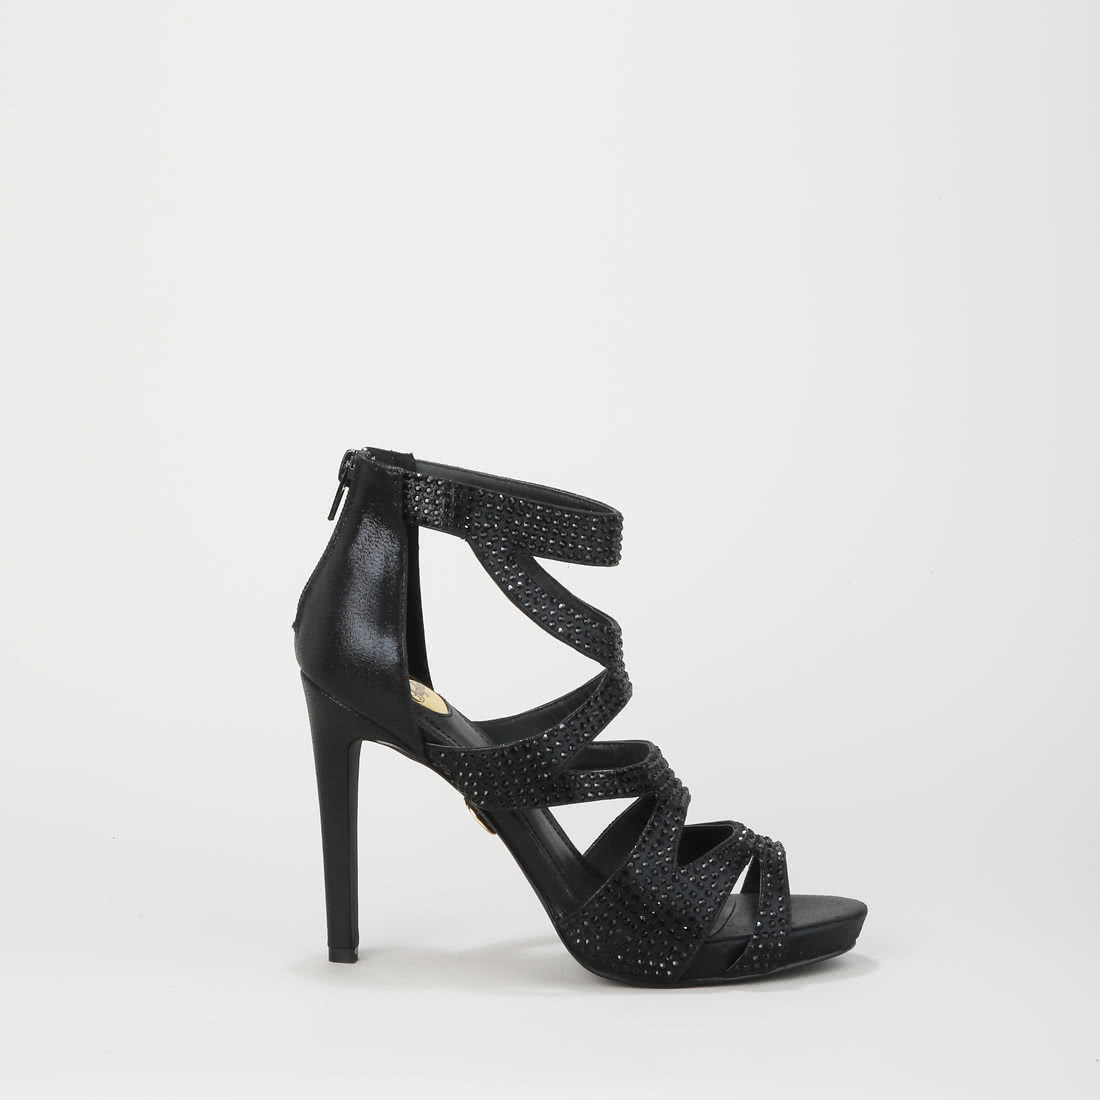 Evending Sand Sandalette schwarz online kaufen   BUFFALO® 2436546928